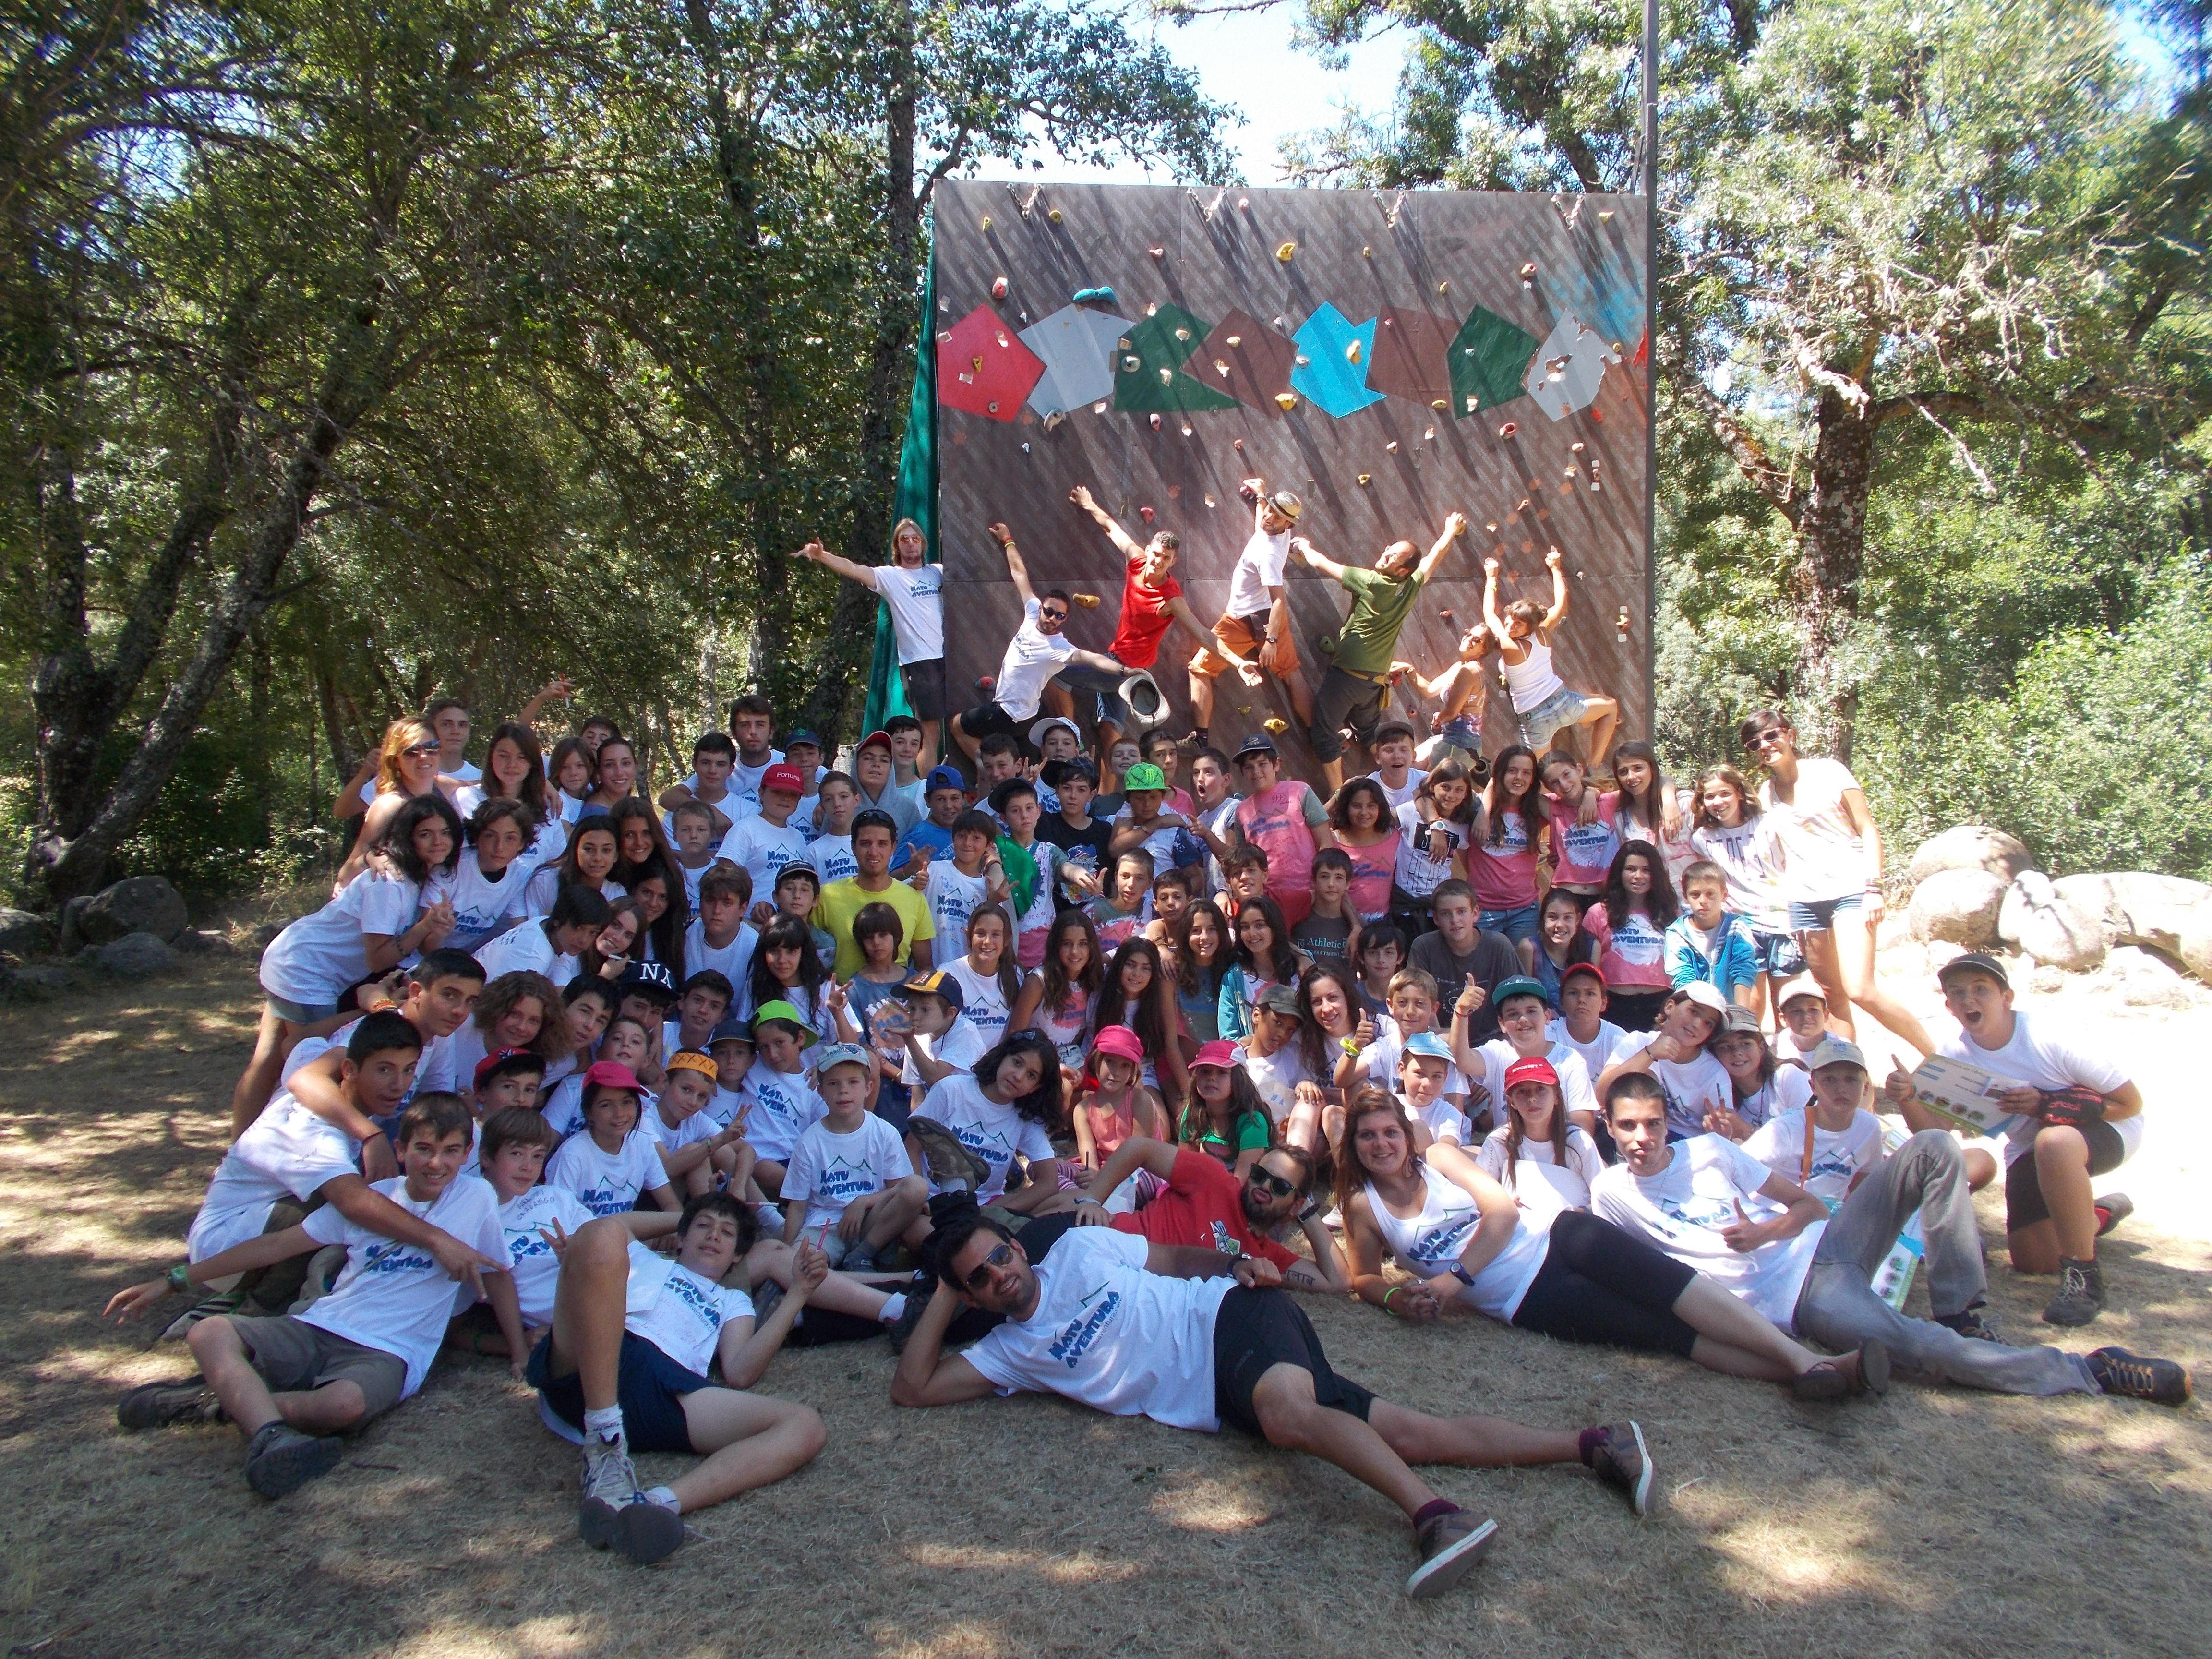 Campamento de verano Barco de Ávila